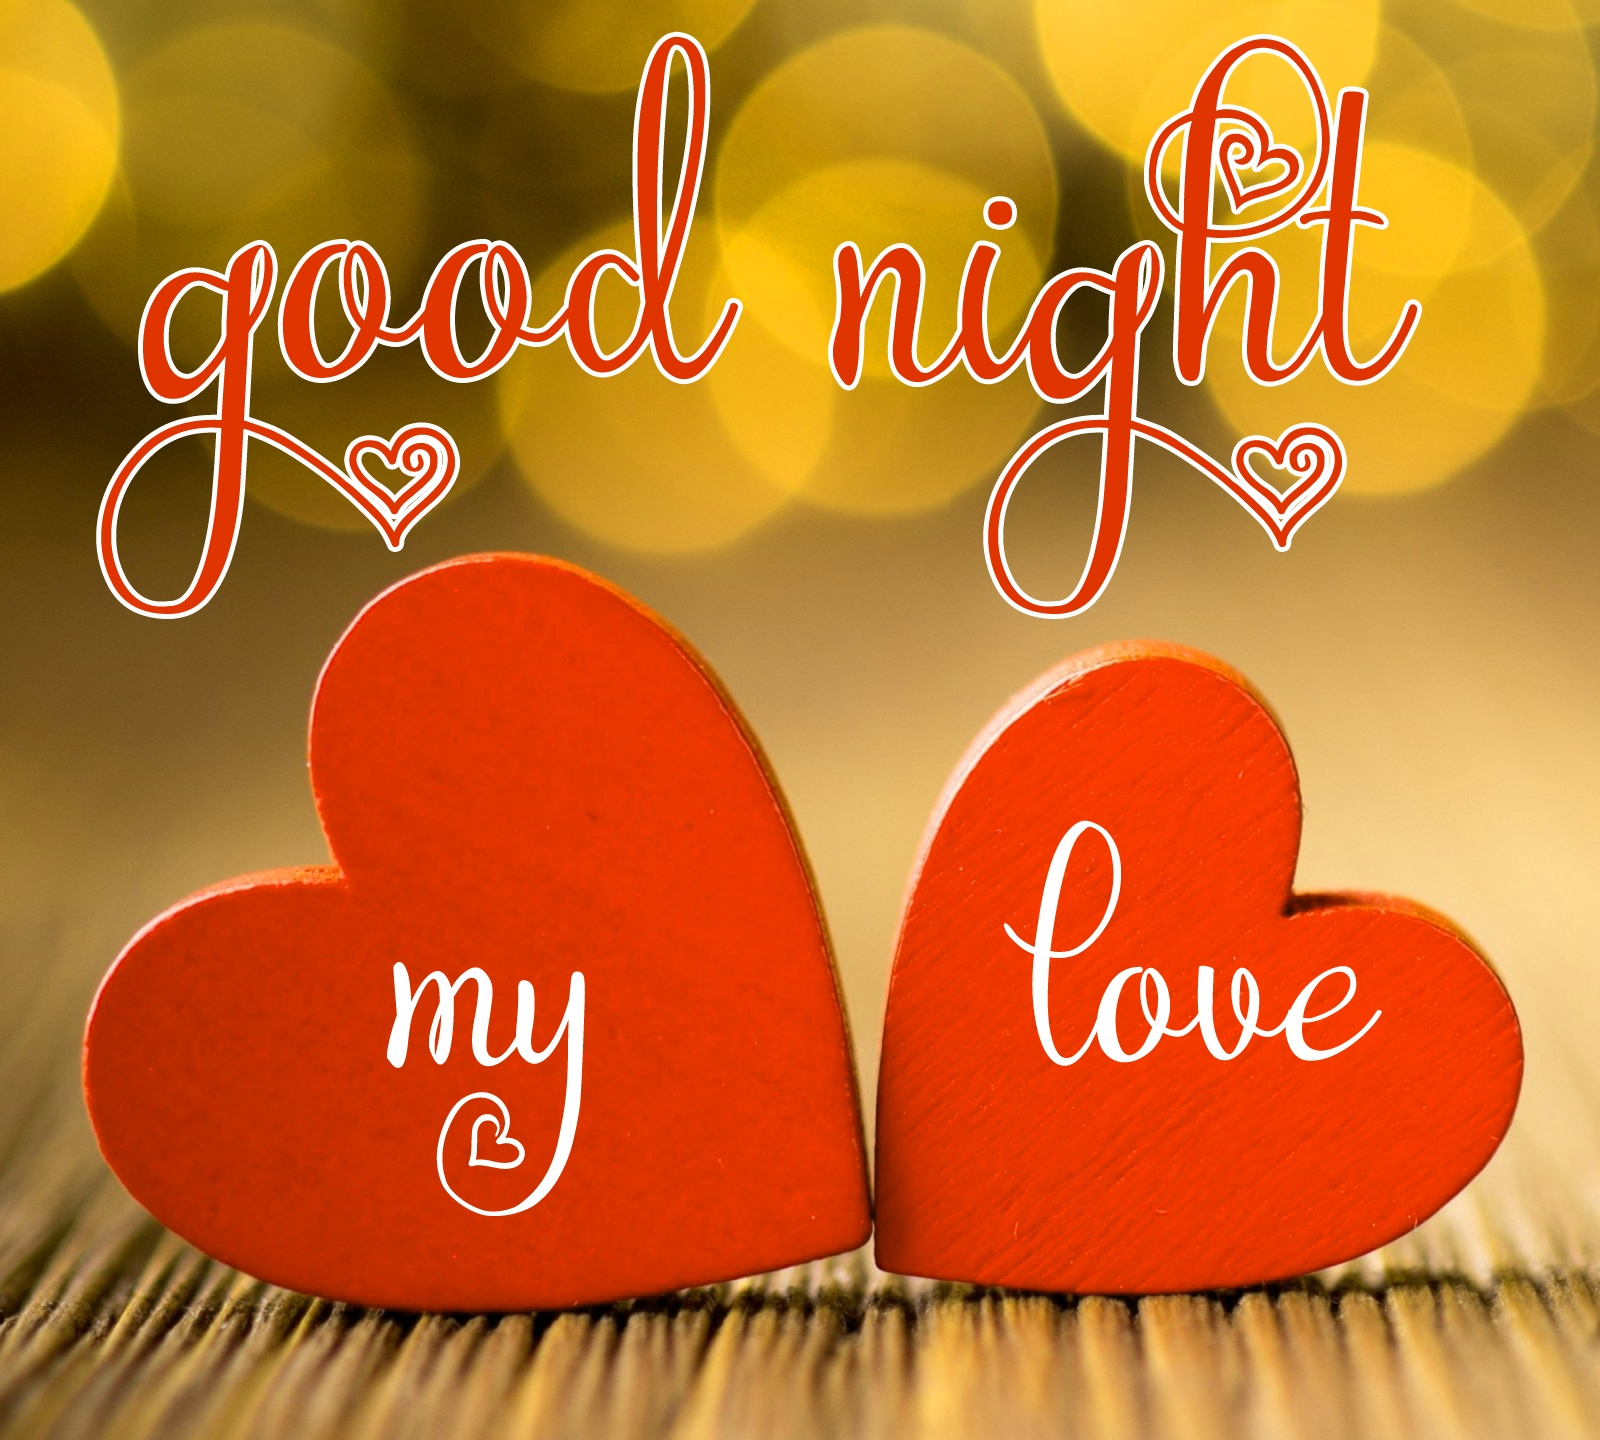 Free good night Images 71